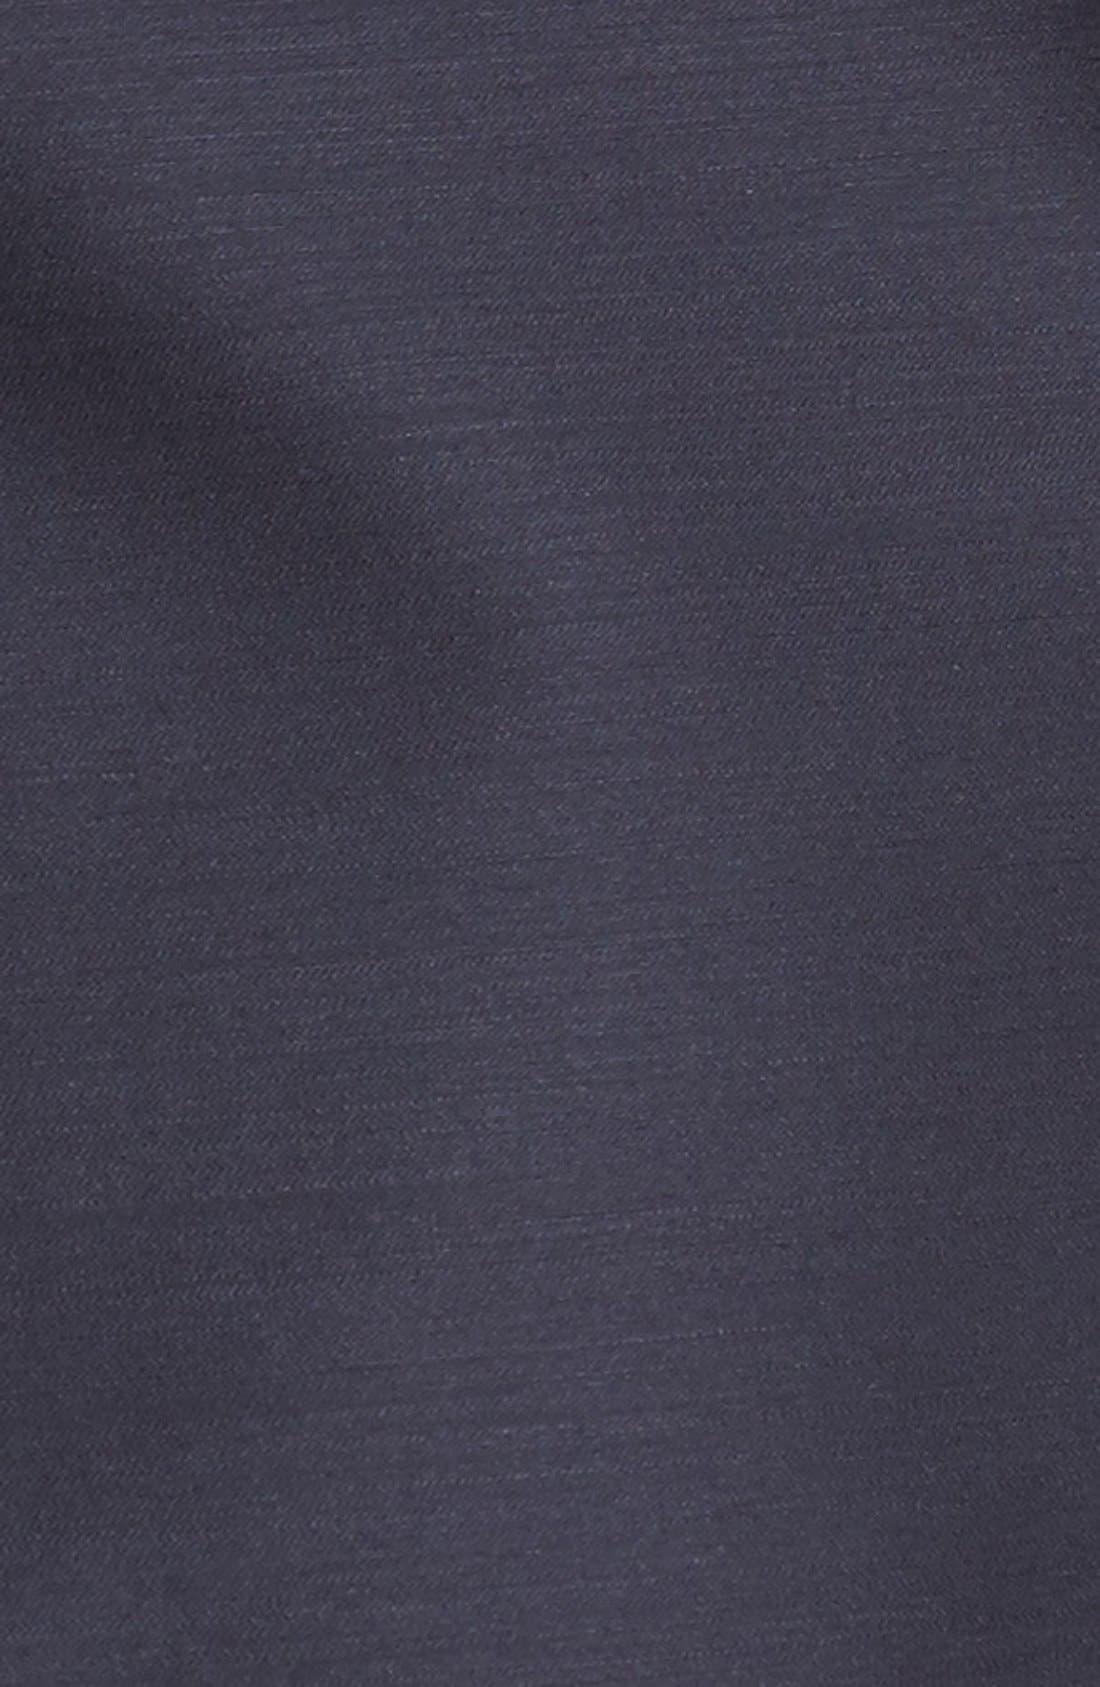 Alternate Image 3  - Nordstrom Signature and Caroline Issa Silk Trim Tuxedo Jacket